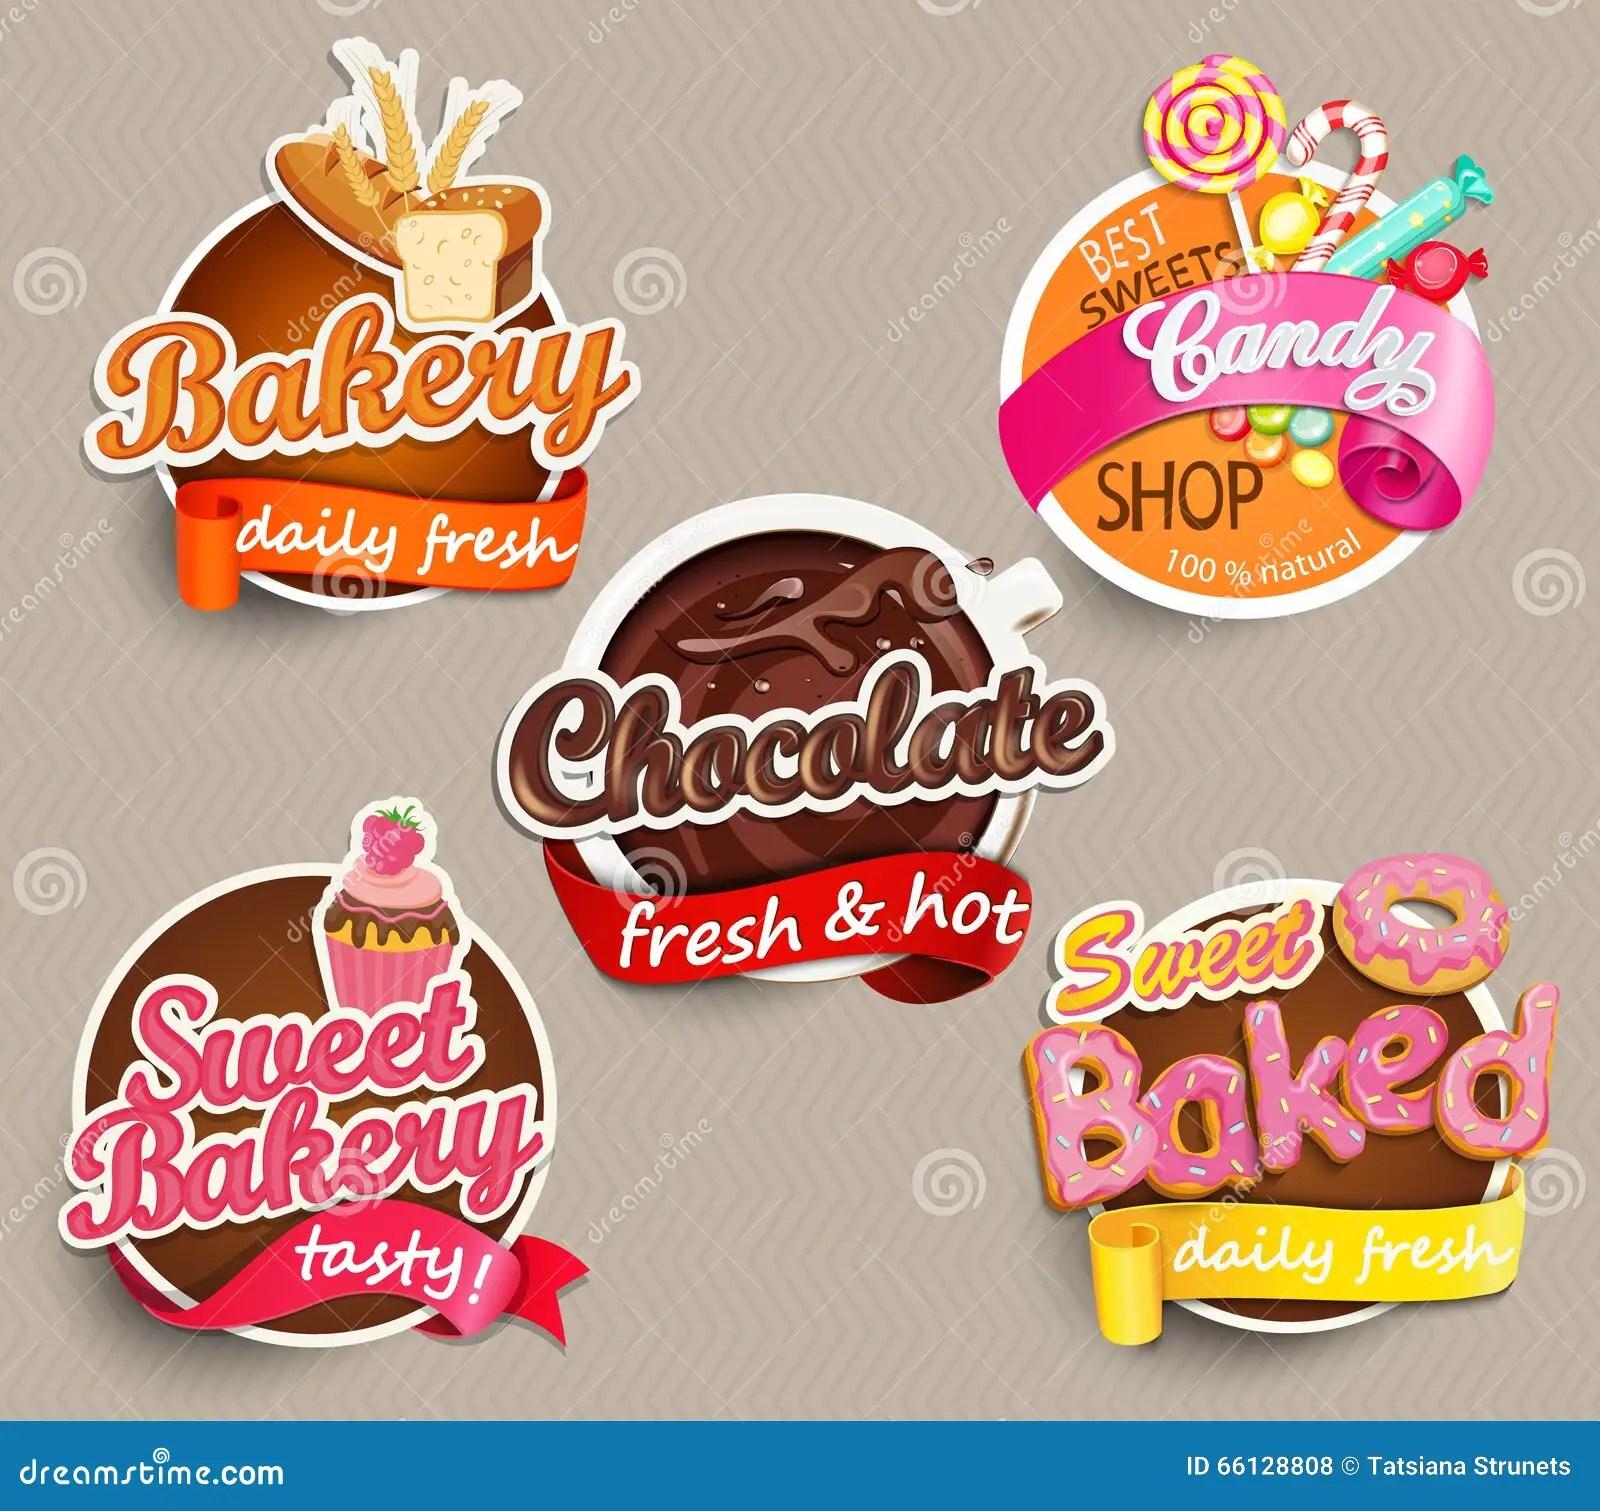 Label design template food label or sticker design template stock